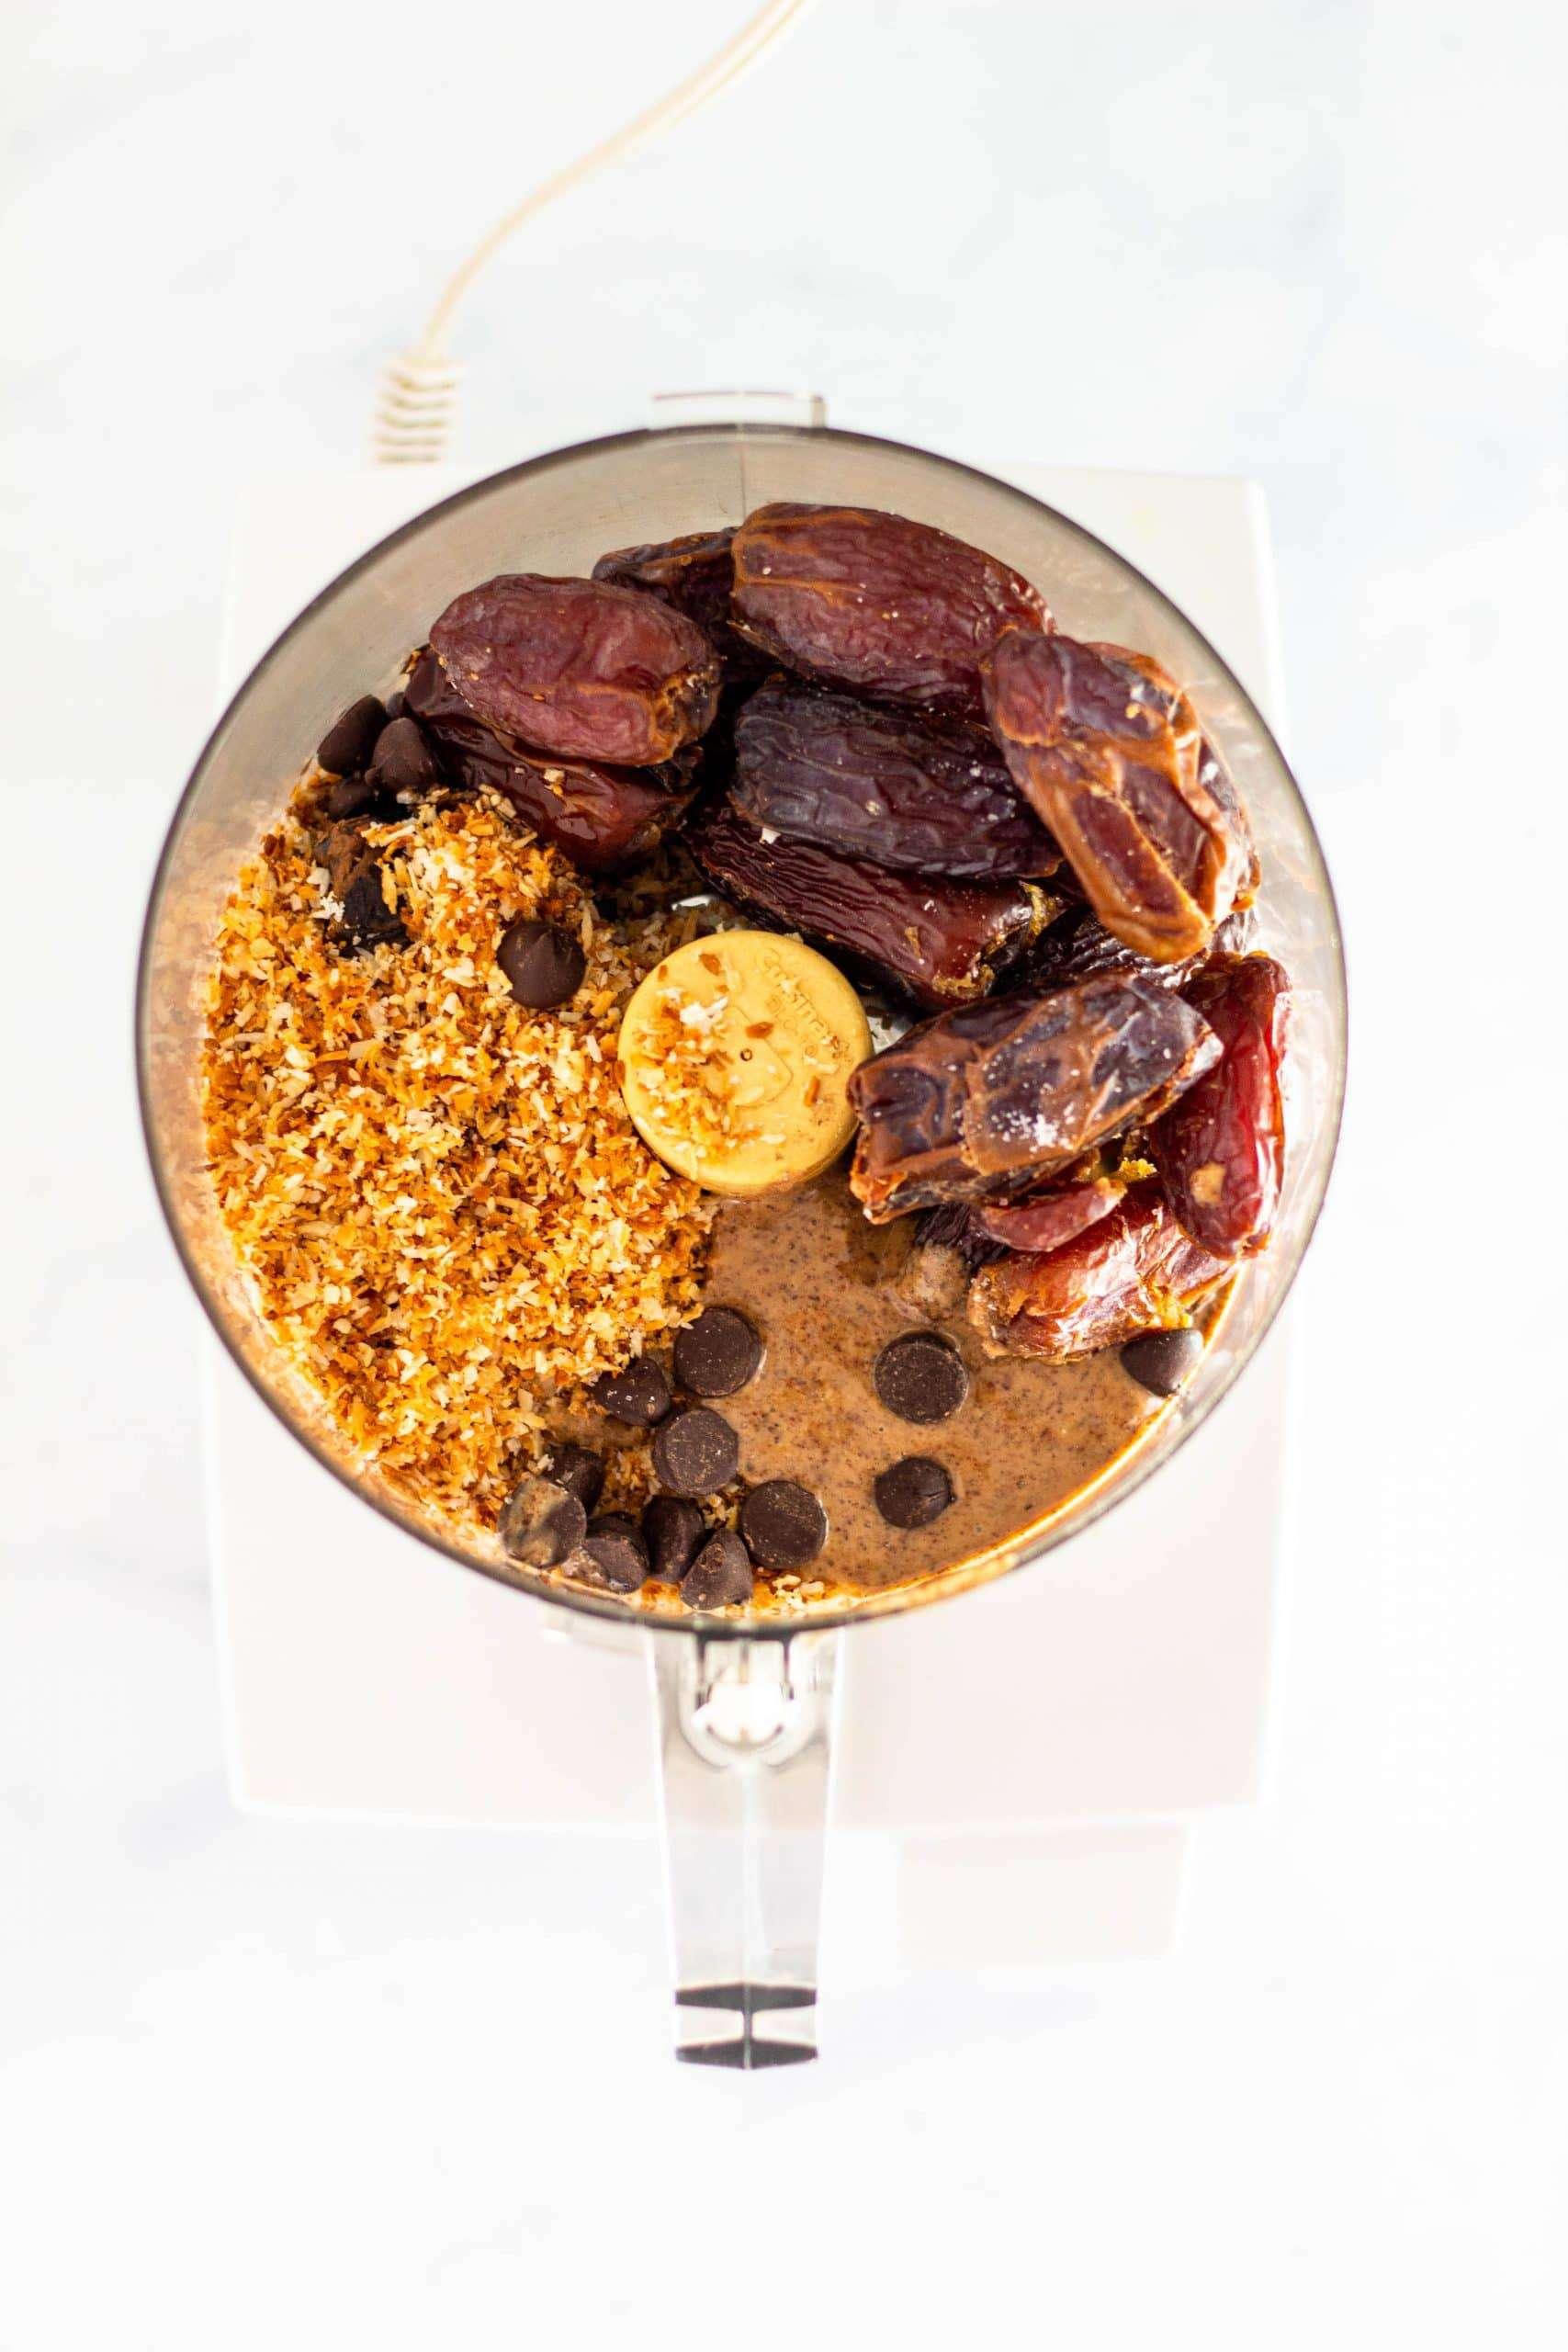 Samoa Snack Bites | Tara Rochford Nutrition #samoas #healthysnack #tararochfordnutrition